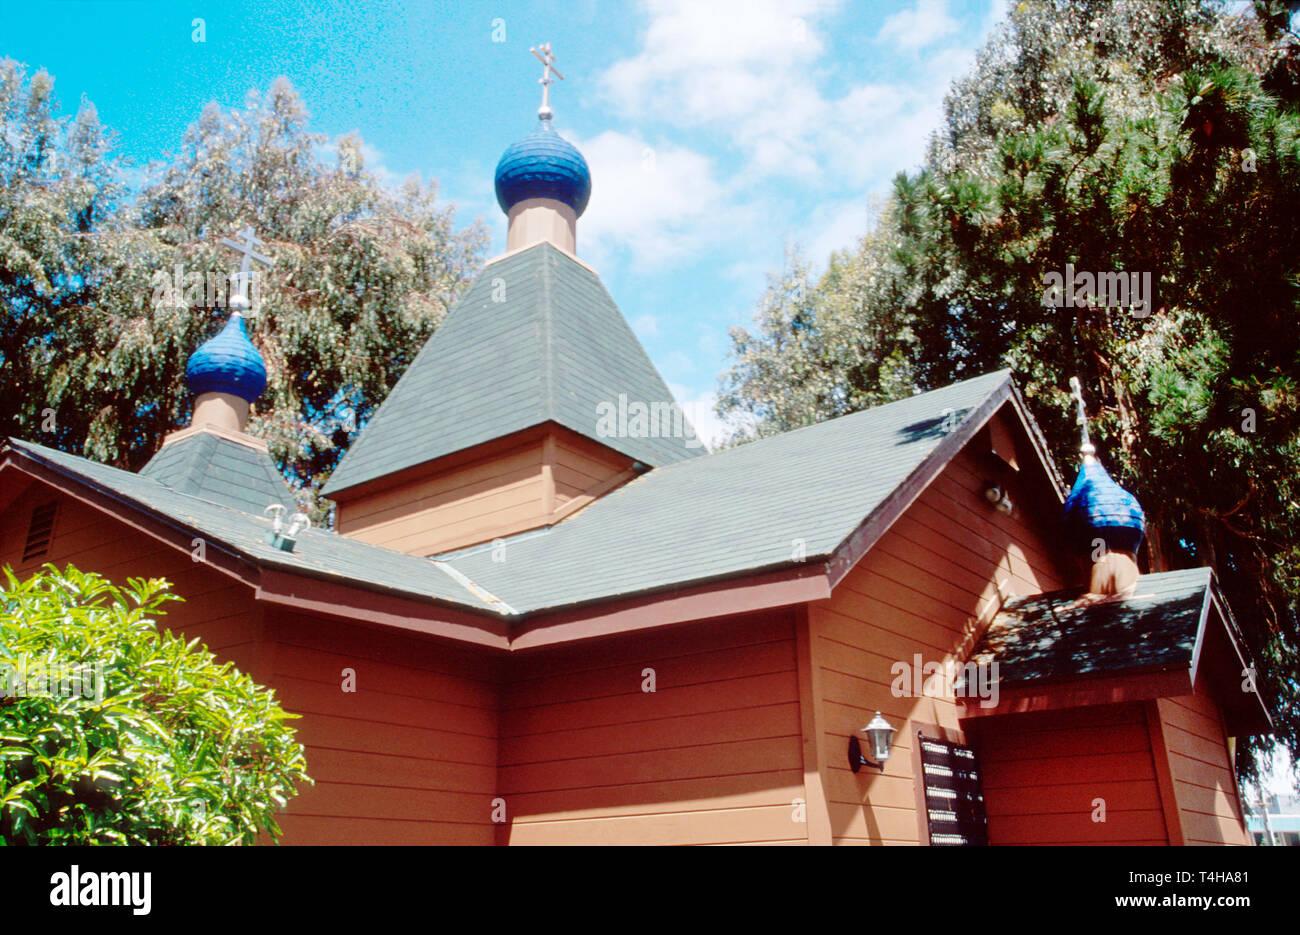 California Monterey County Seaside St. Seraphim Eastern Orthodox Church - Stock Image